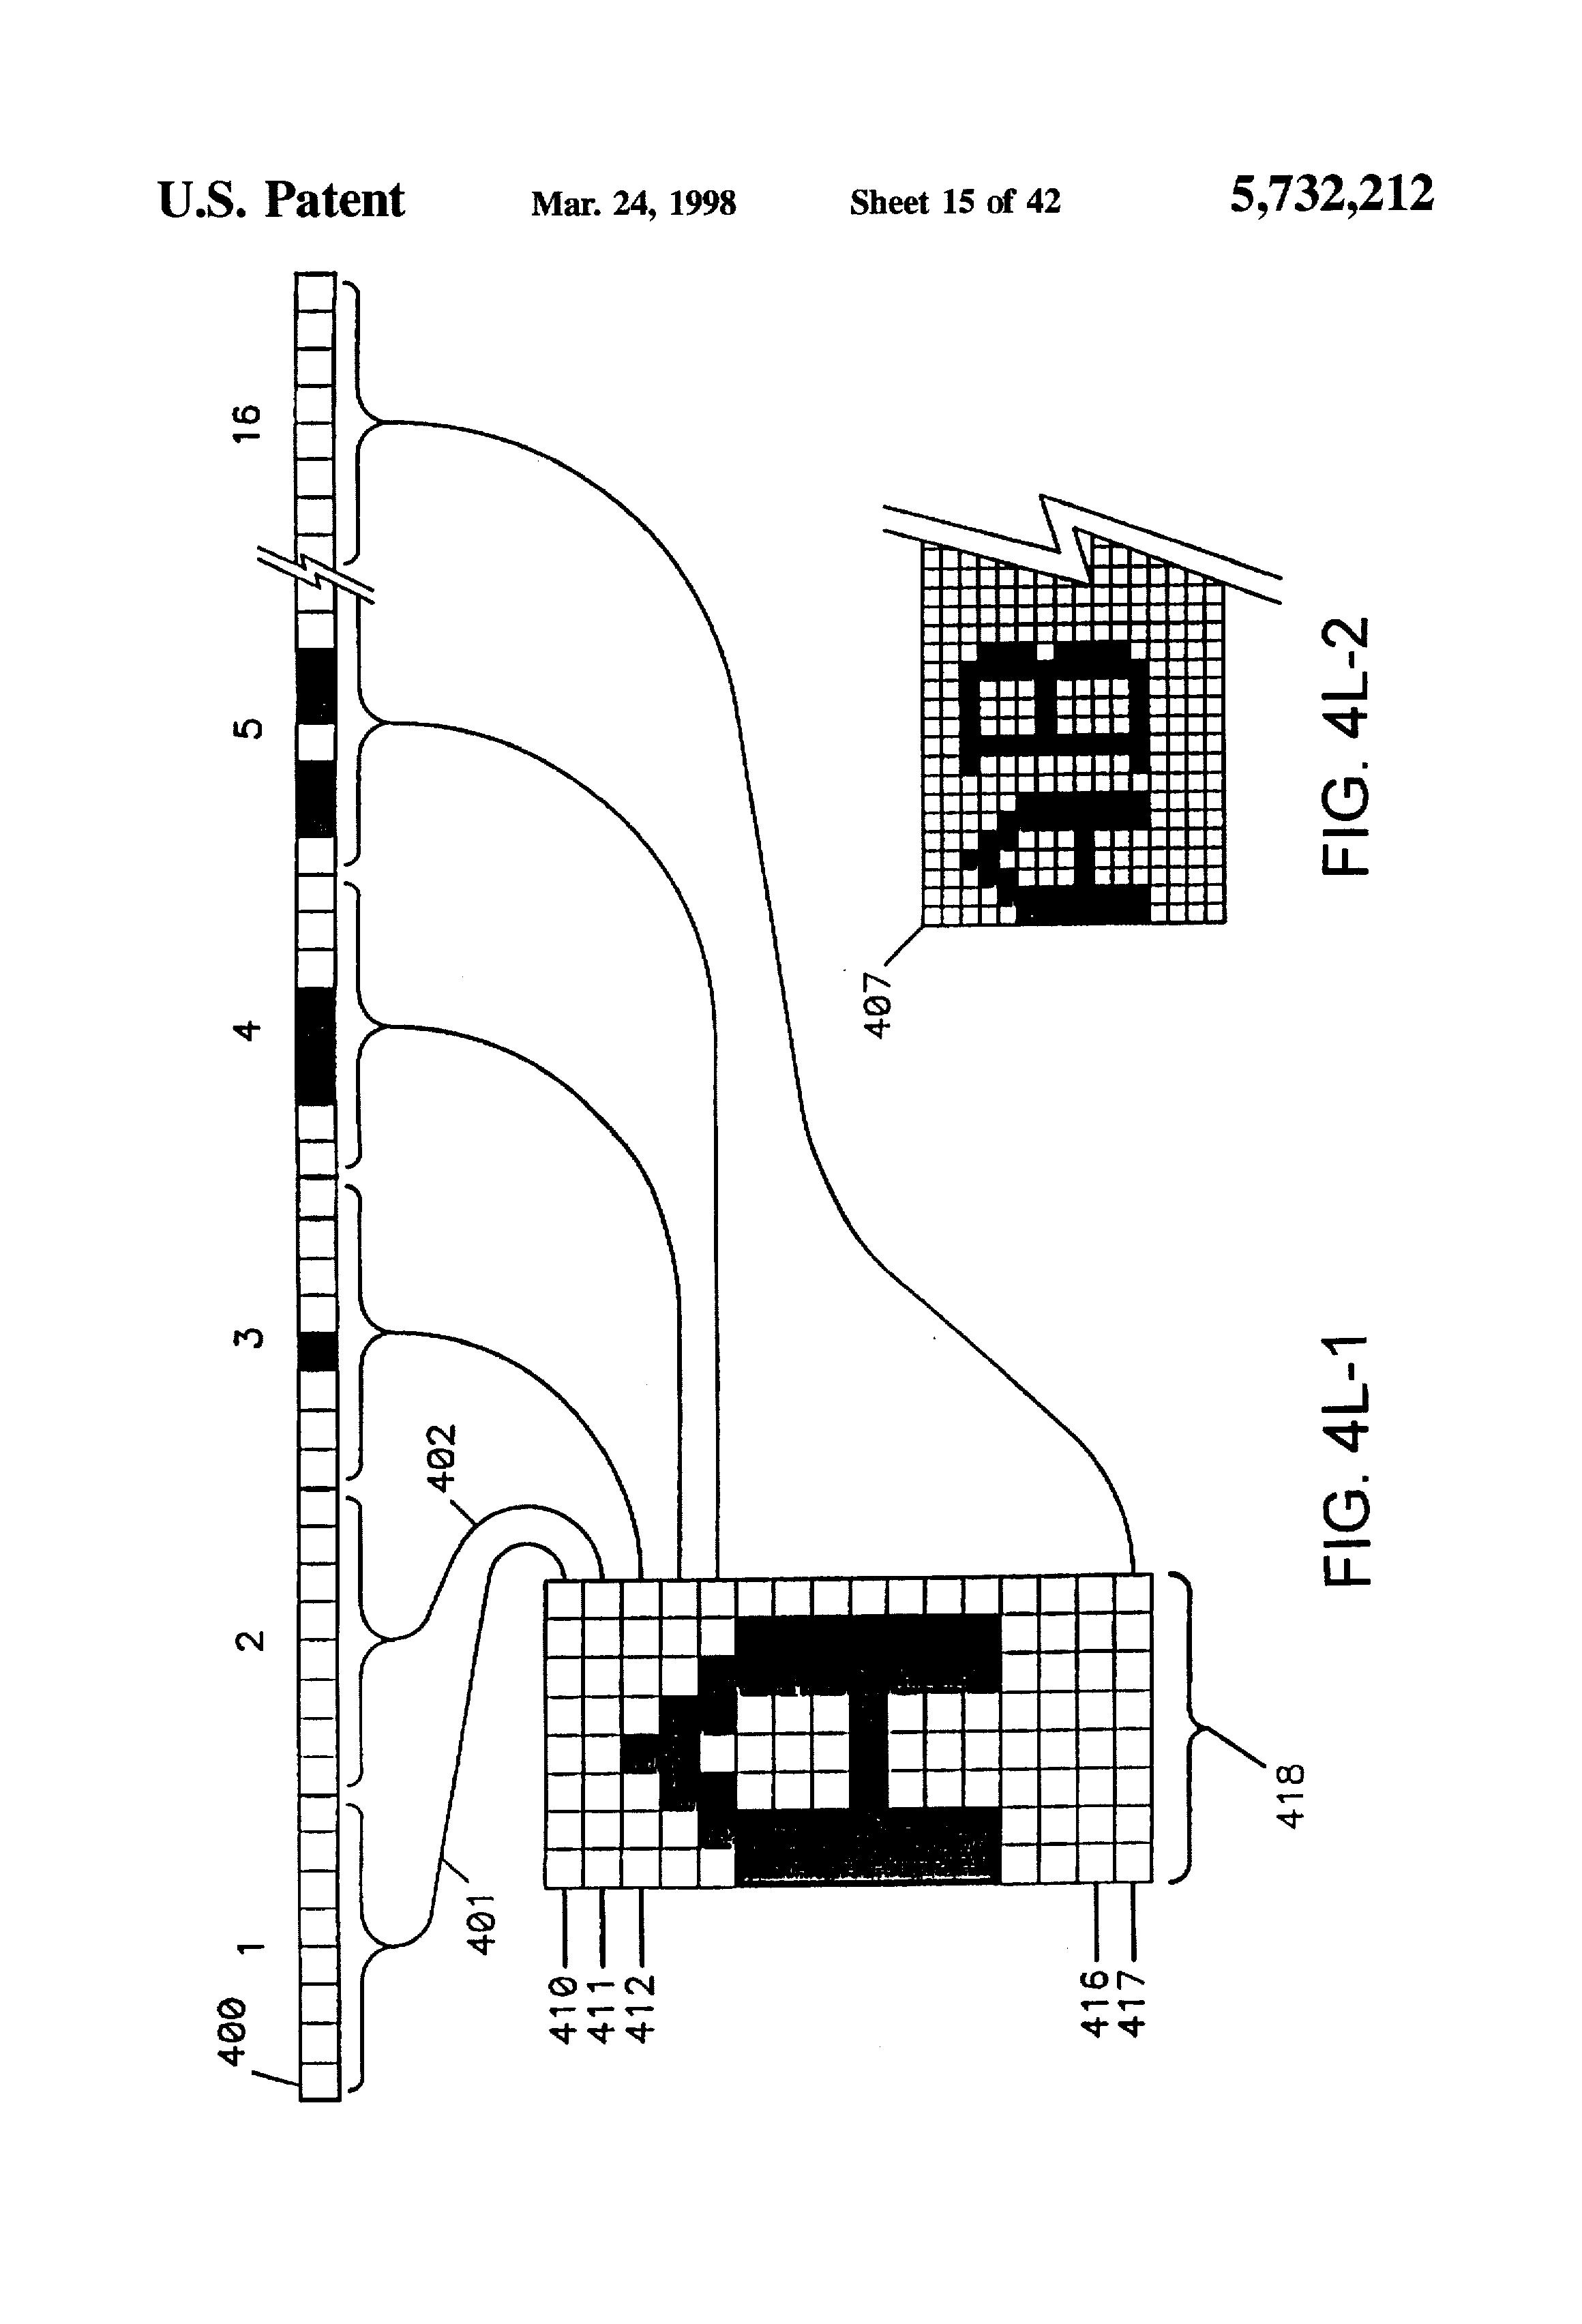 Patent Us5732212 System And Method For Remote Monitoring Free Circuit Diagrams 4u Basic Sound Generator Diagram Drawing